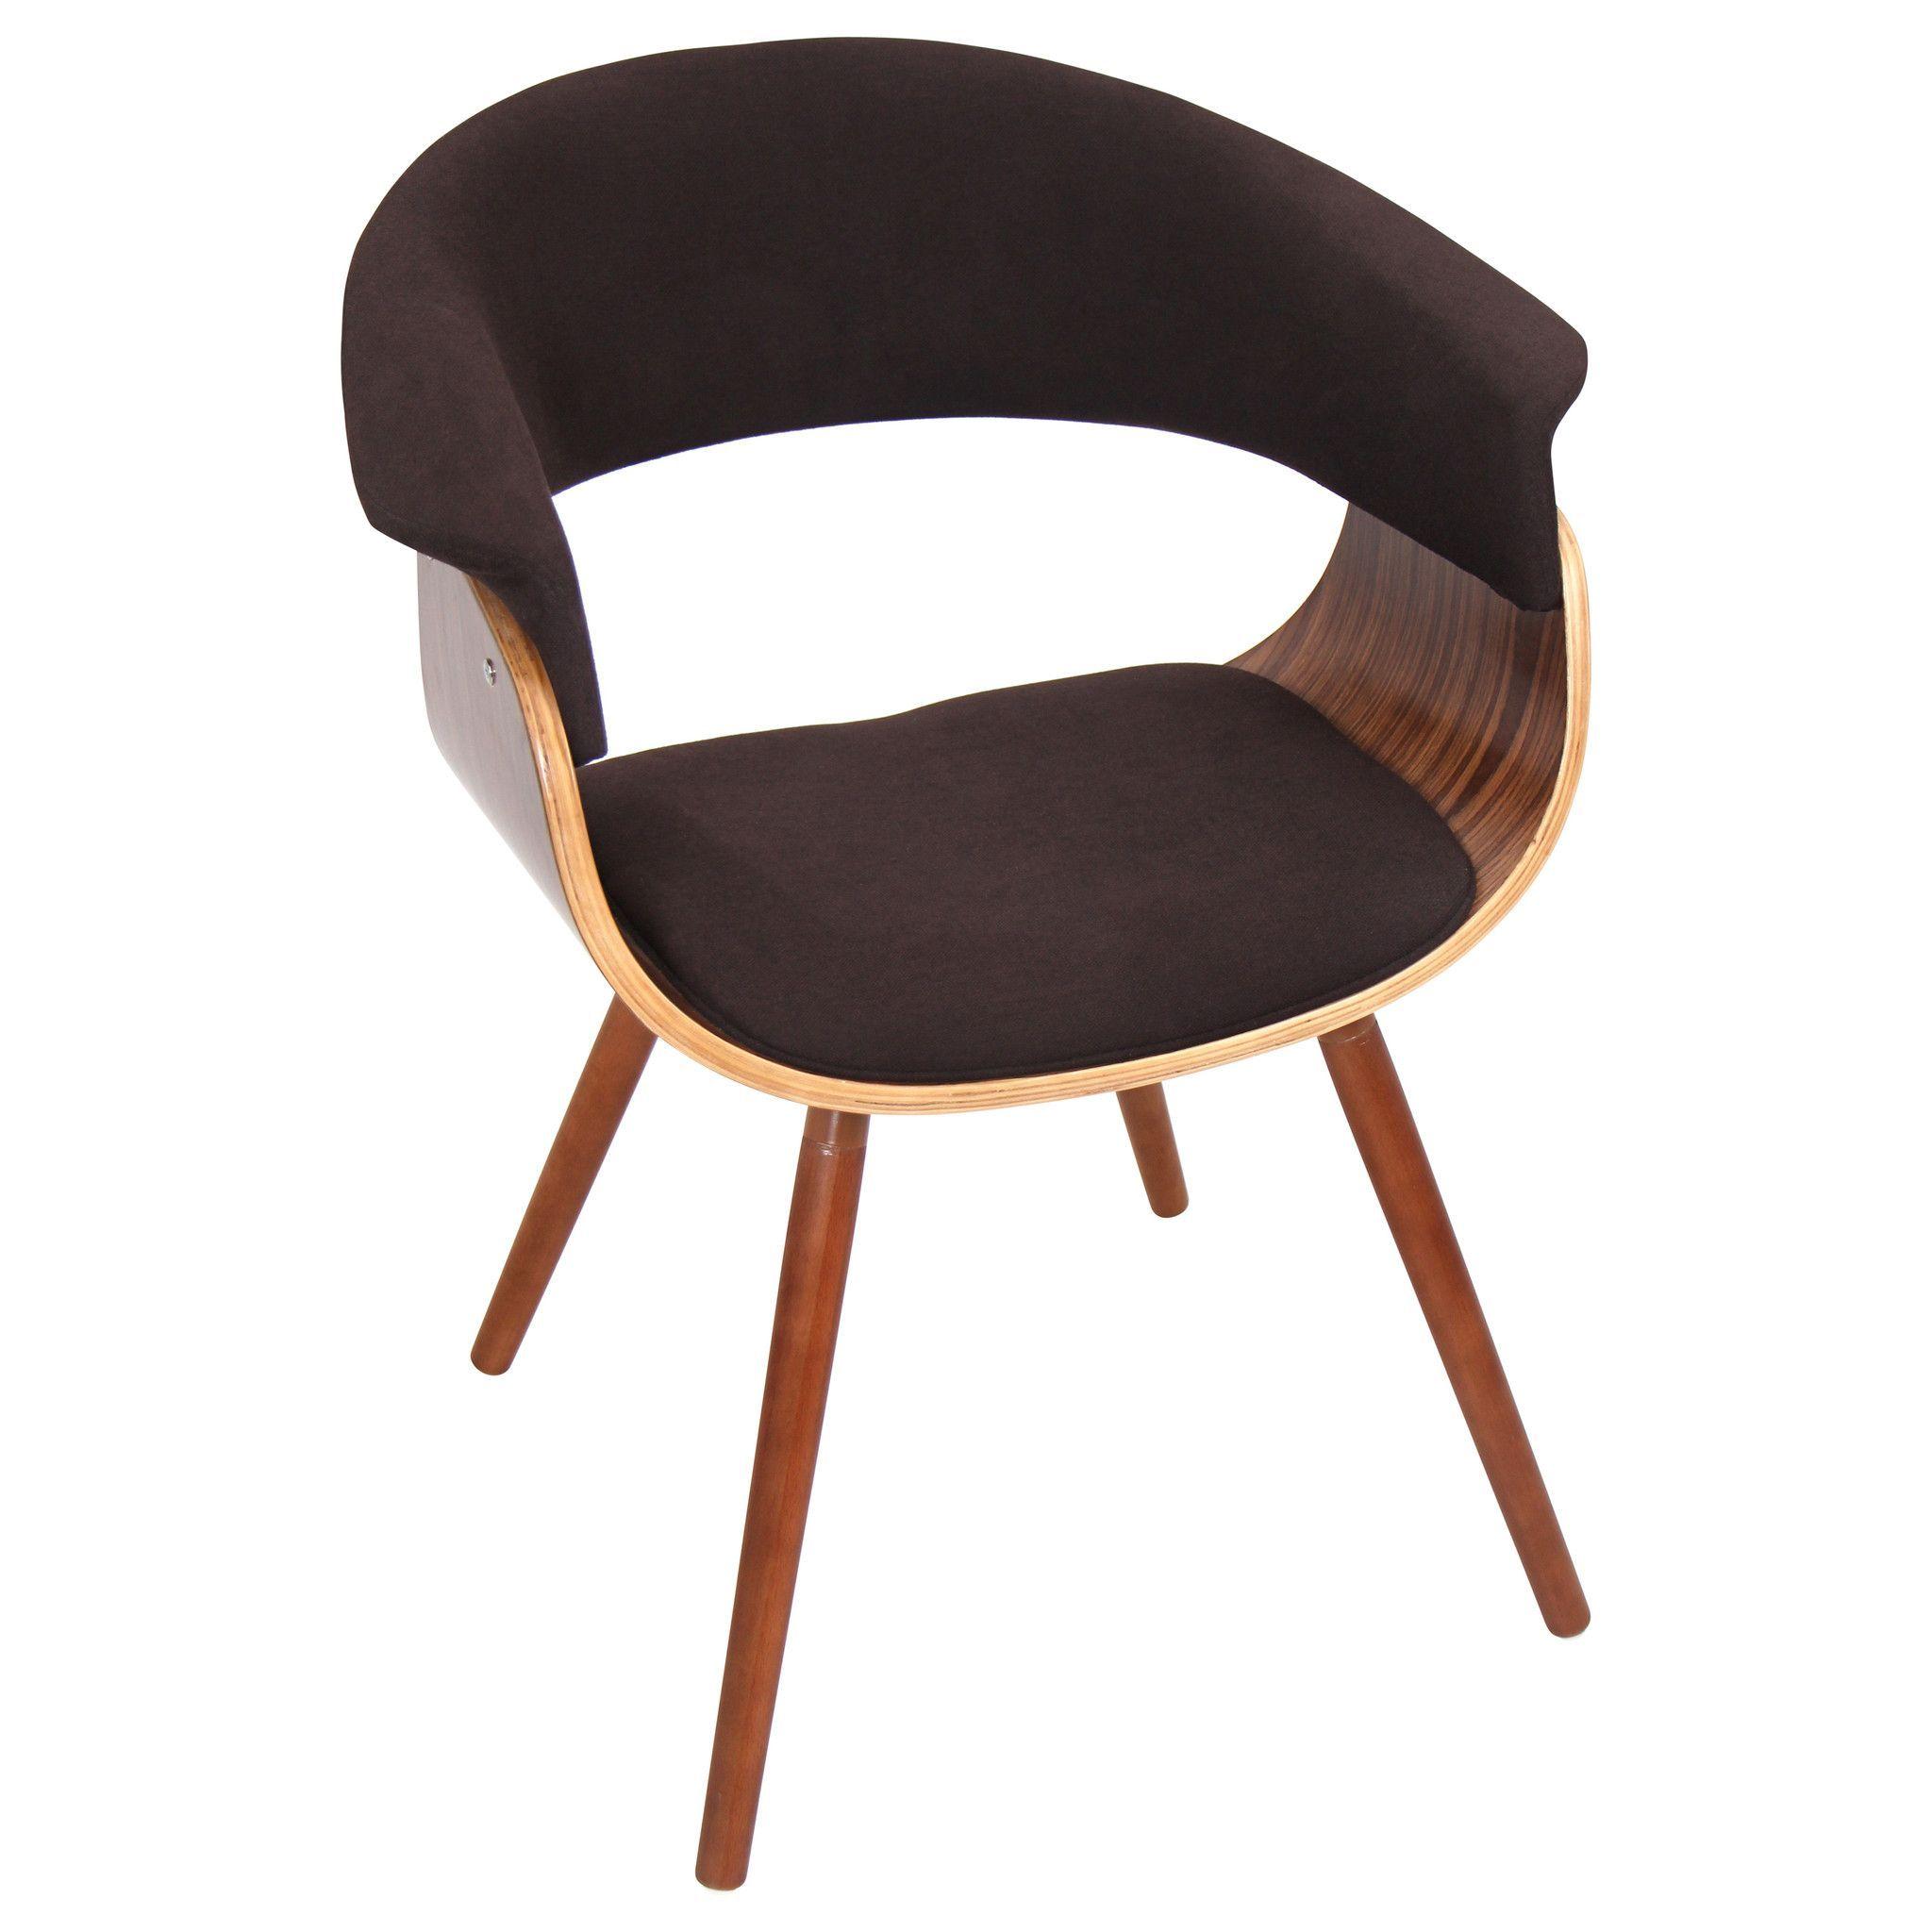 Lumisource Vintage Mod Chair Bent